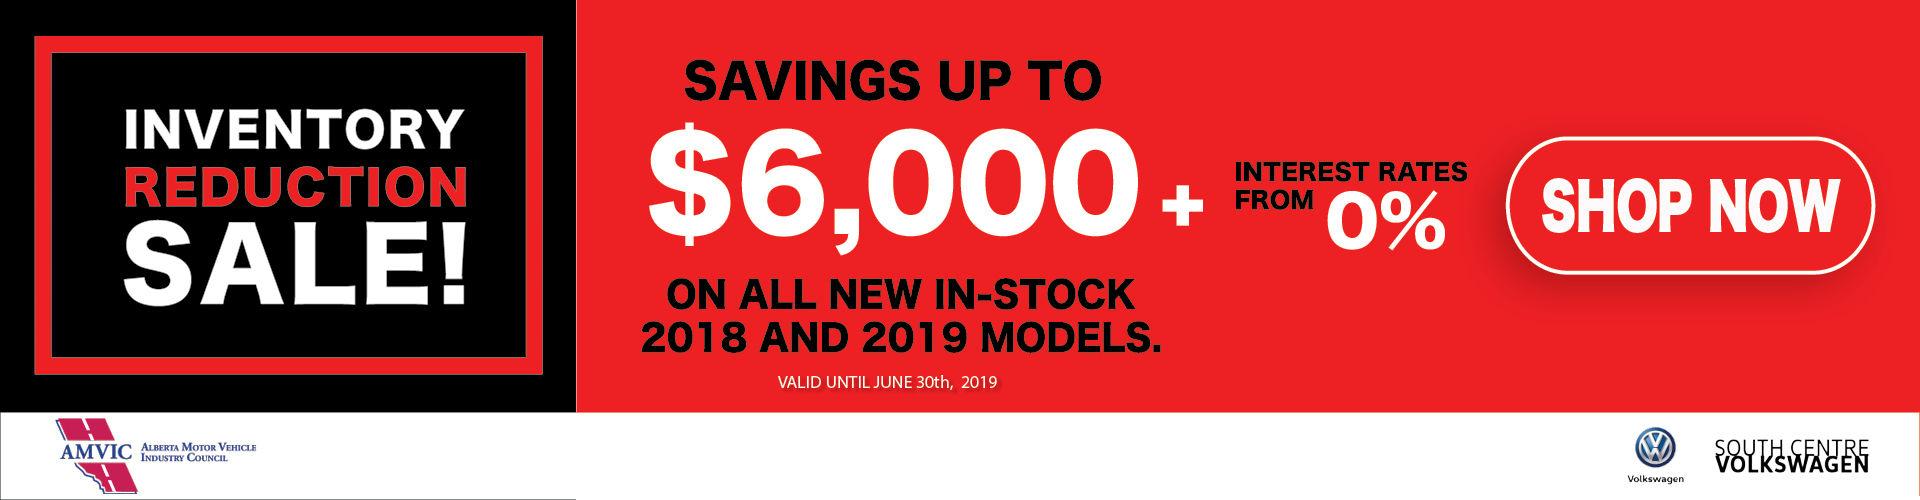 Inventory Reductions Sale | Desktop